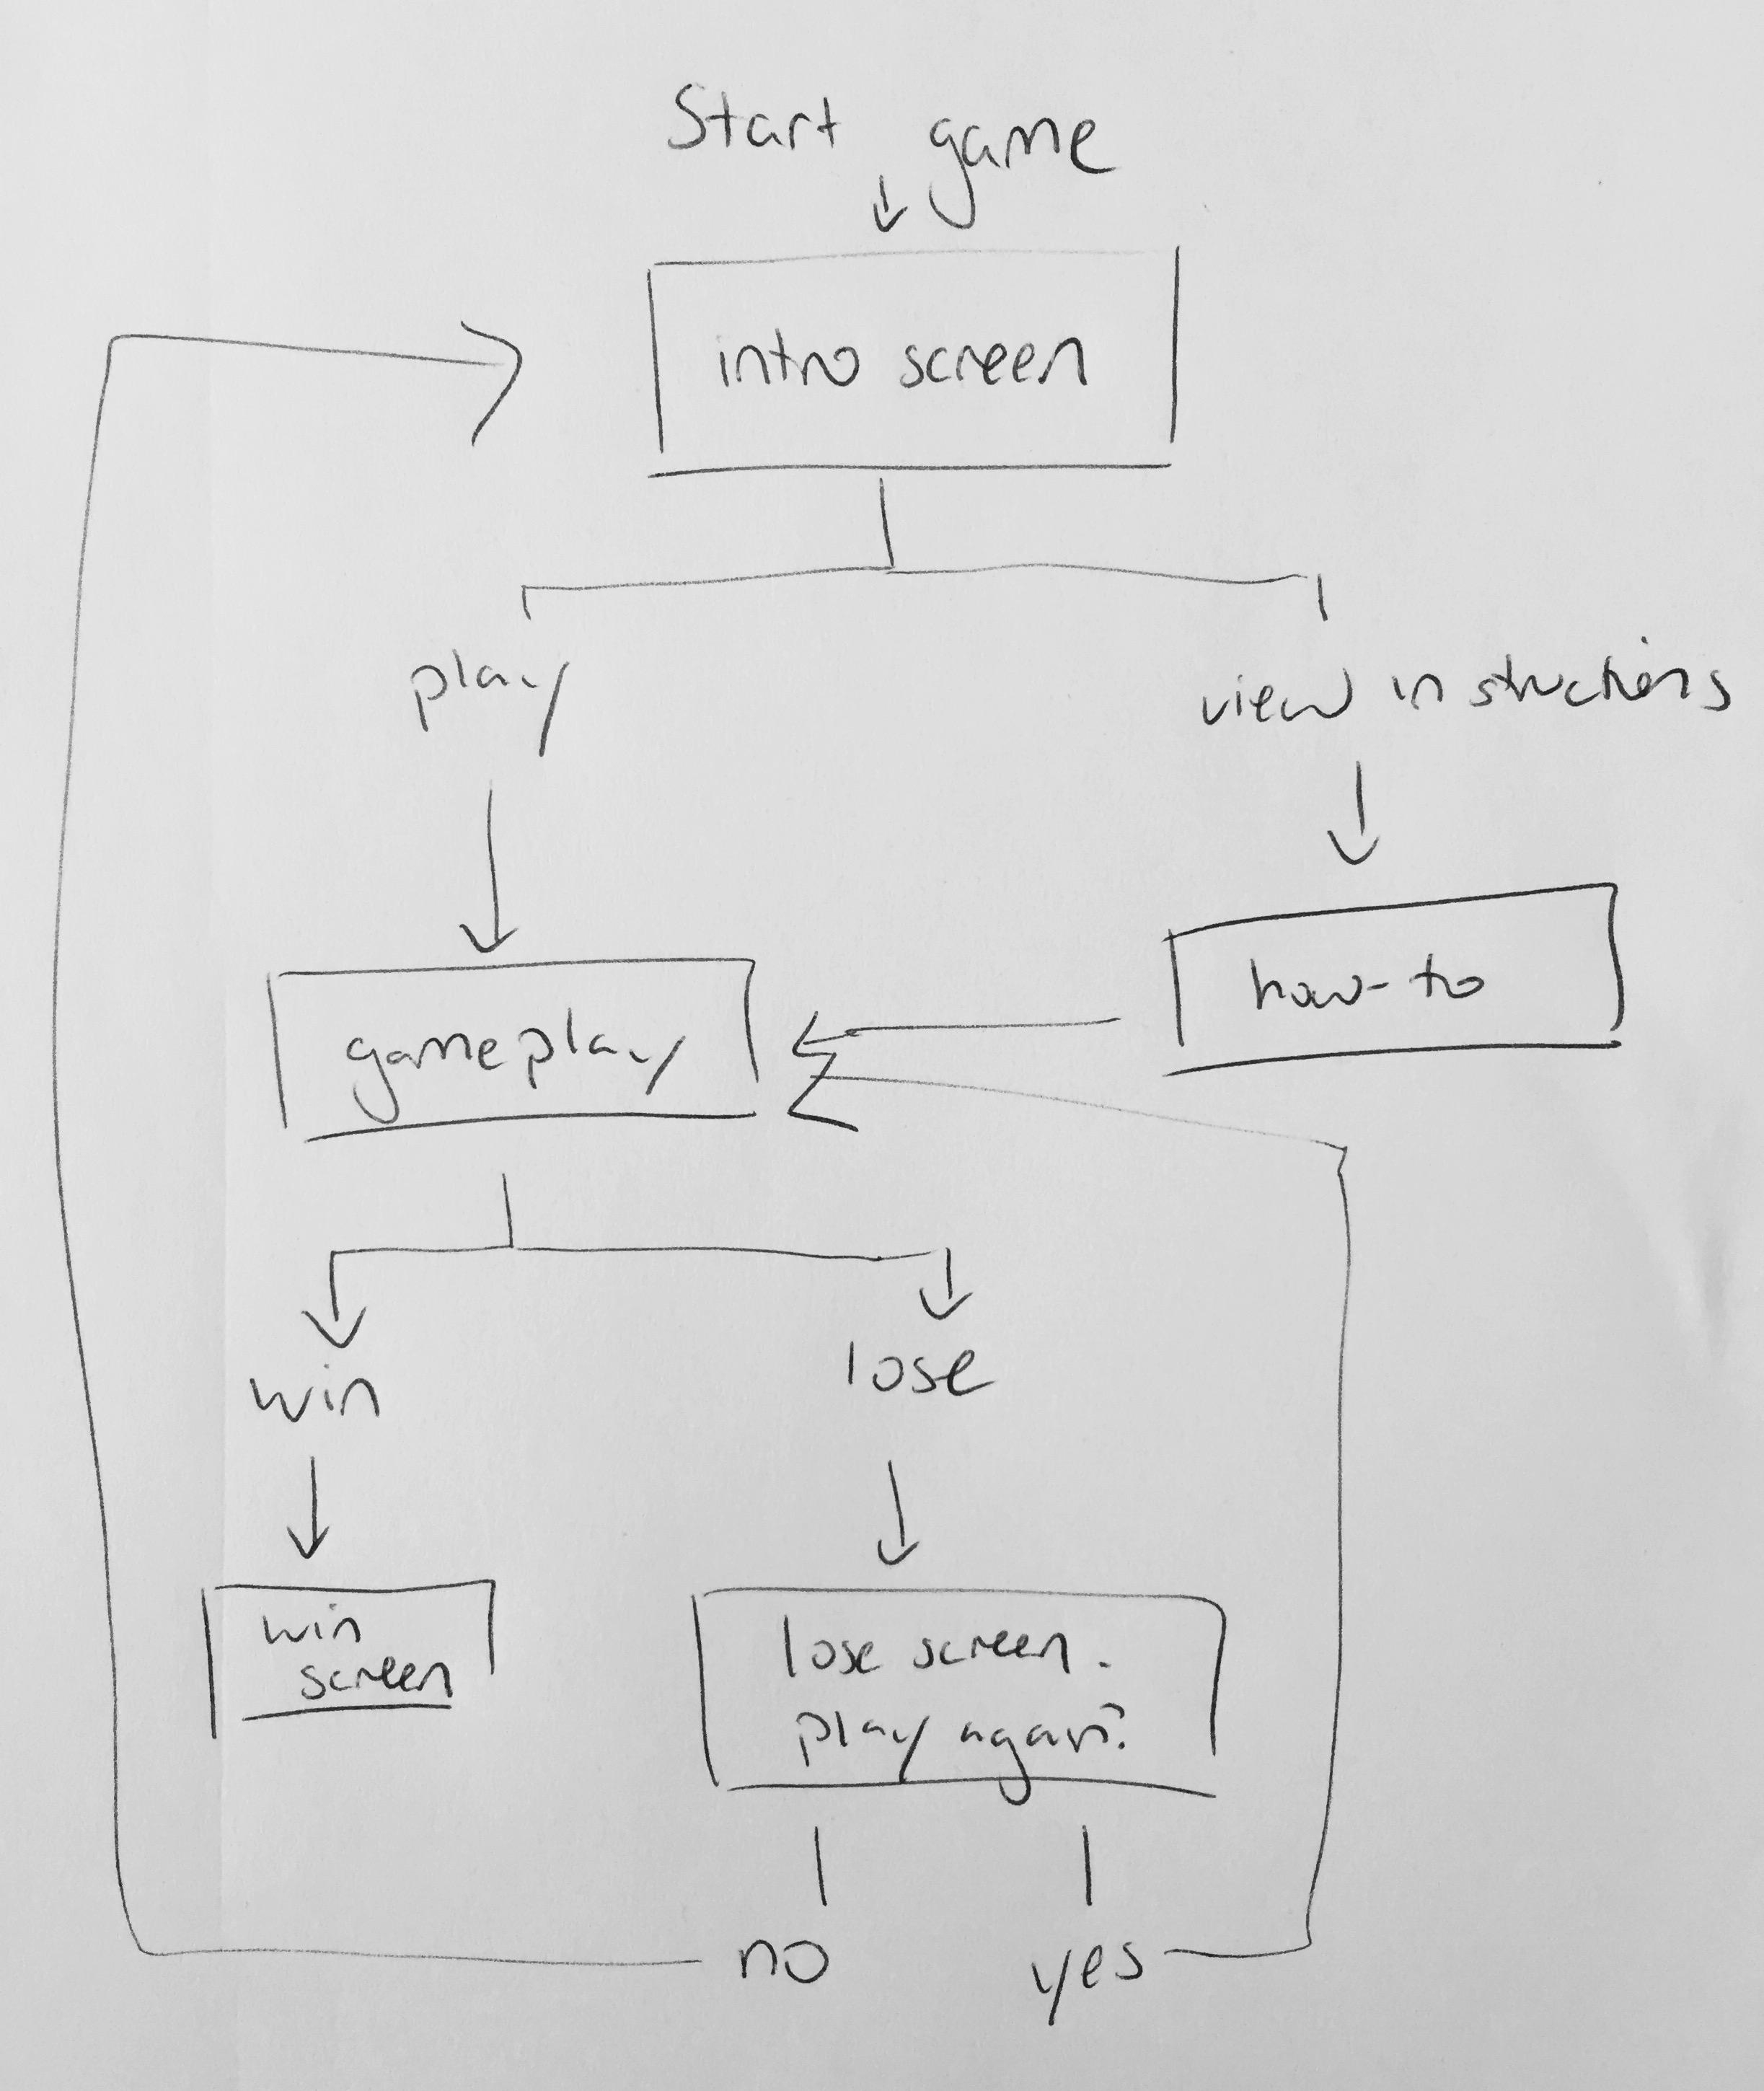 Rough sketch of user flow